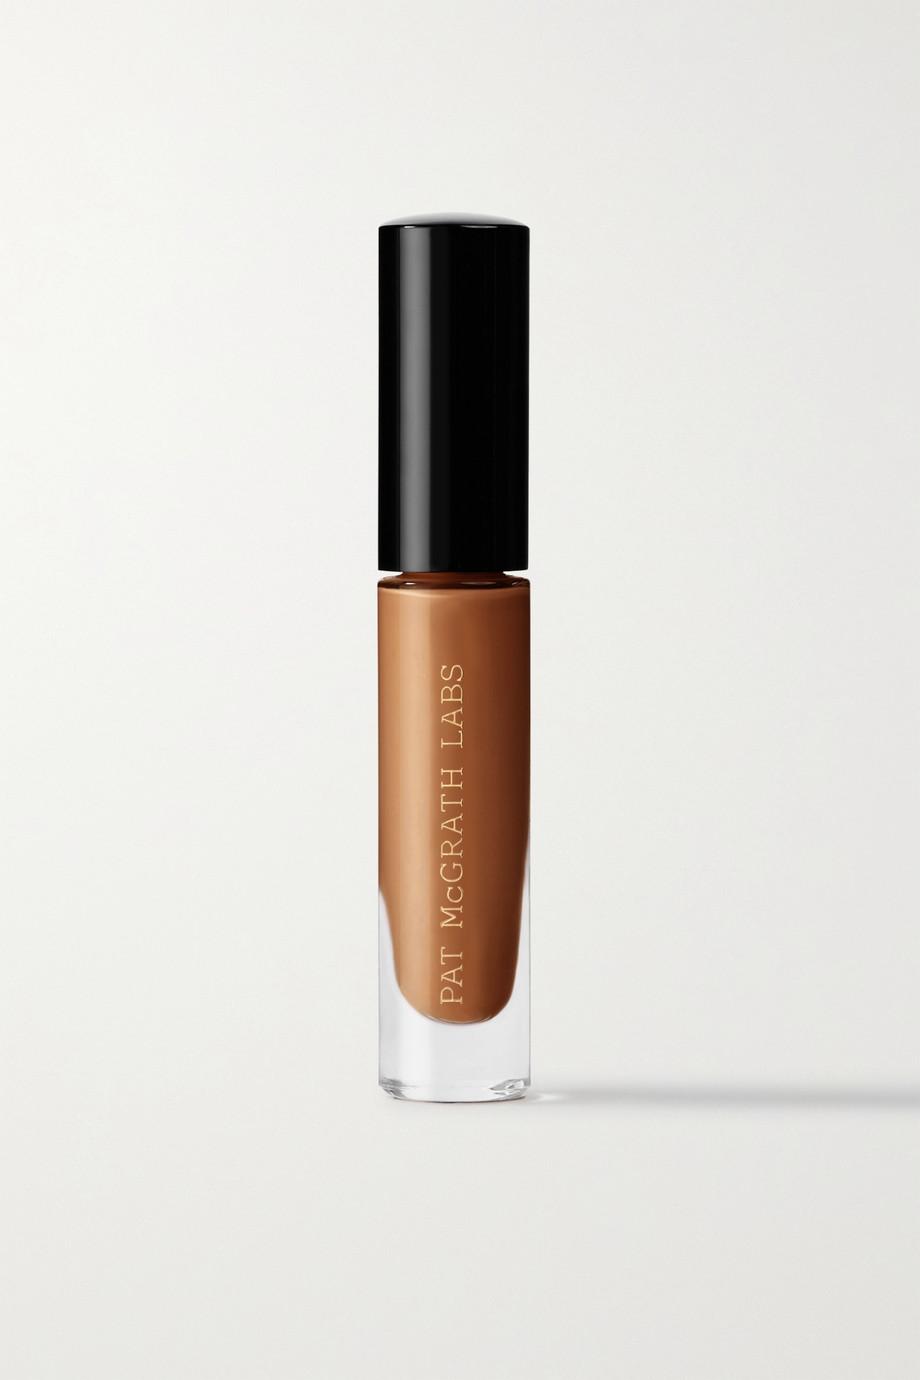 Pat McGrath Labs Skin Fetish: Sublime Perfection Concealer - MD26, 5ml